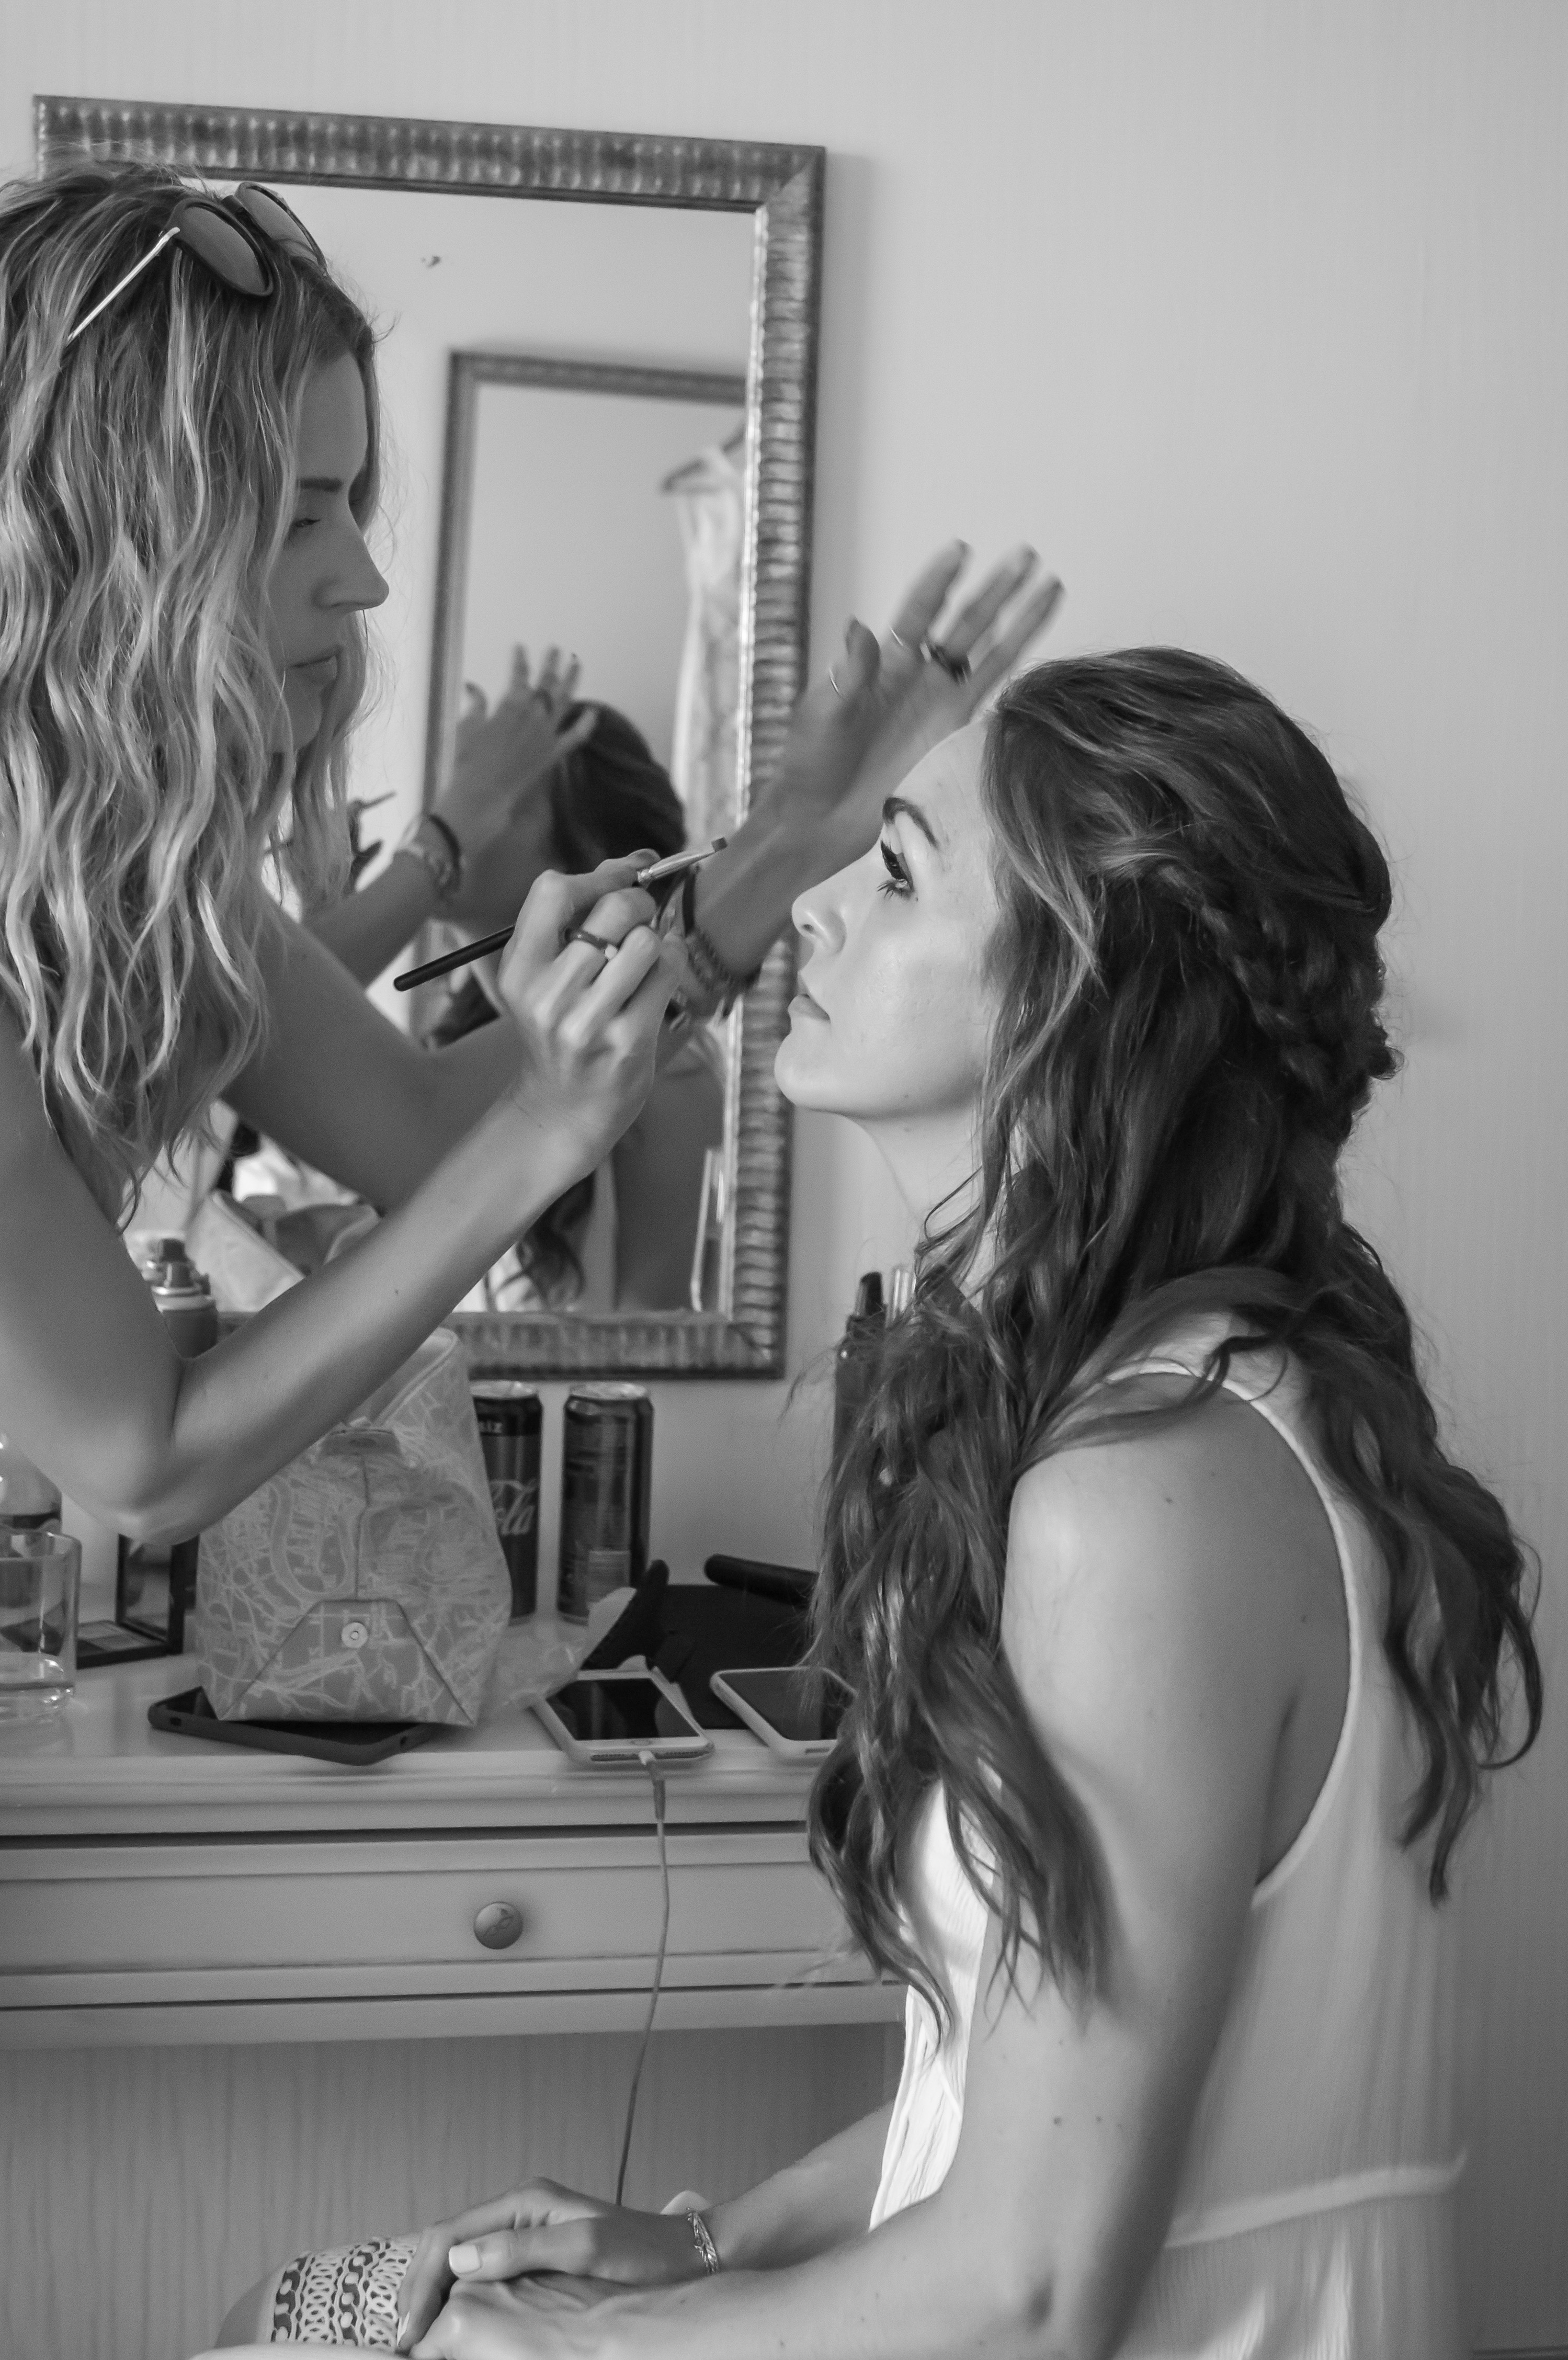 Gemma Sutton applies makeup to stunning brunette bride Fran who has a half up half down hair